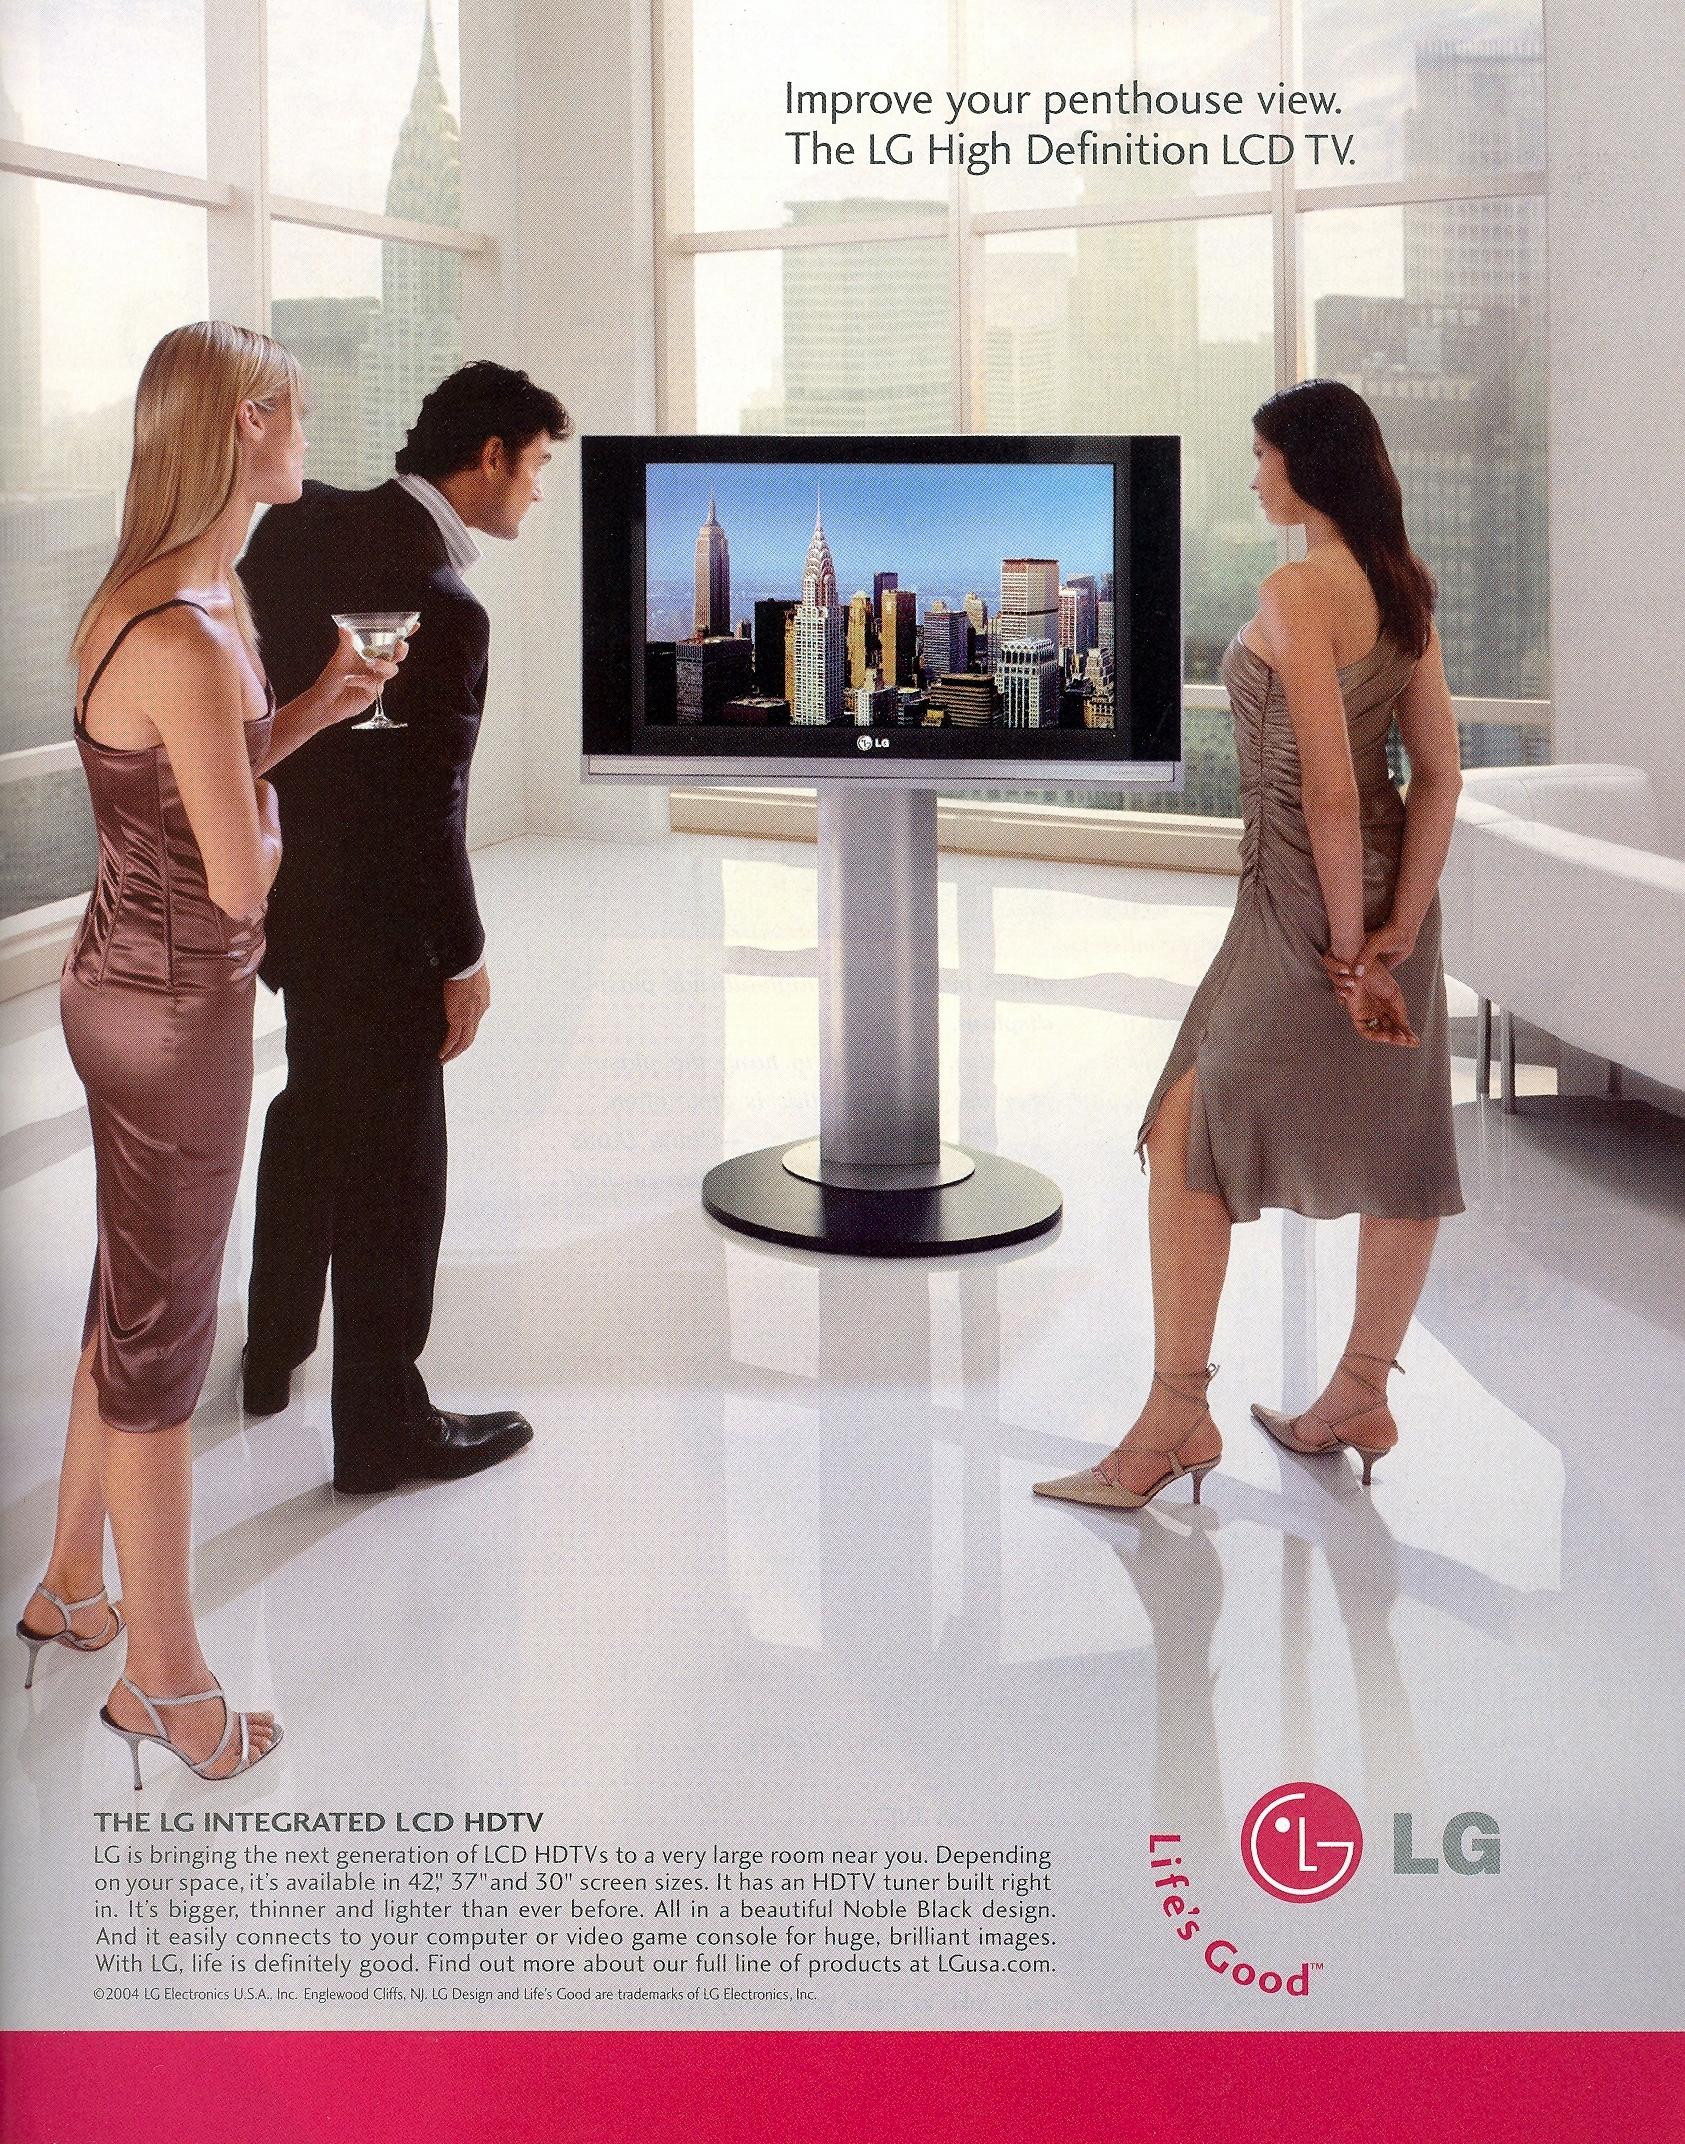 Vista - LG Ad